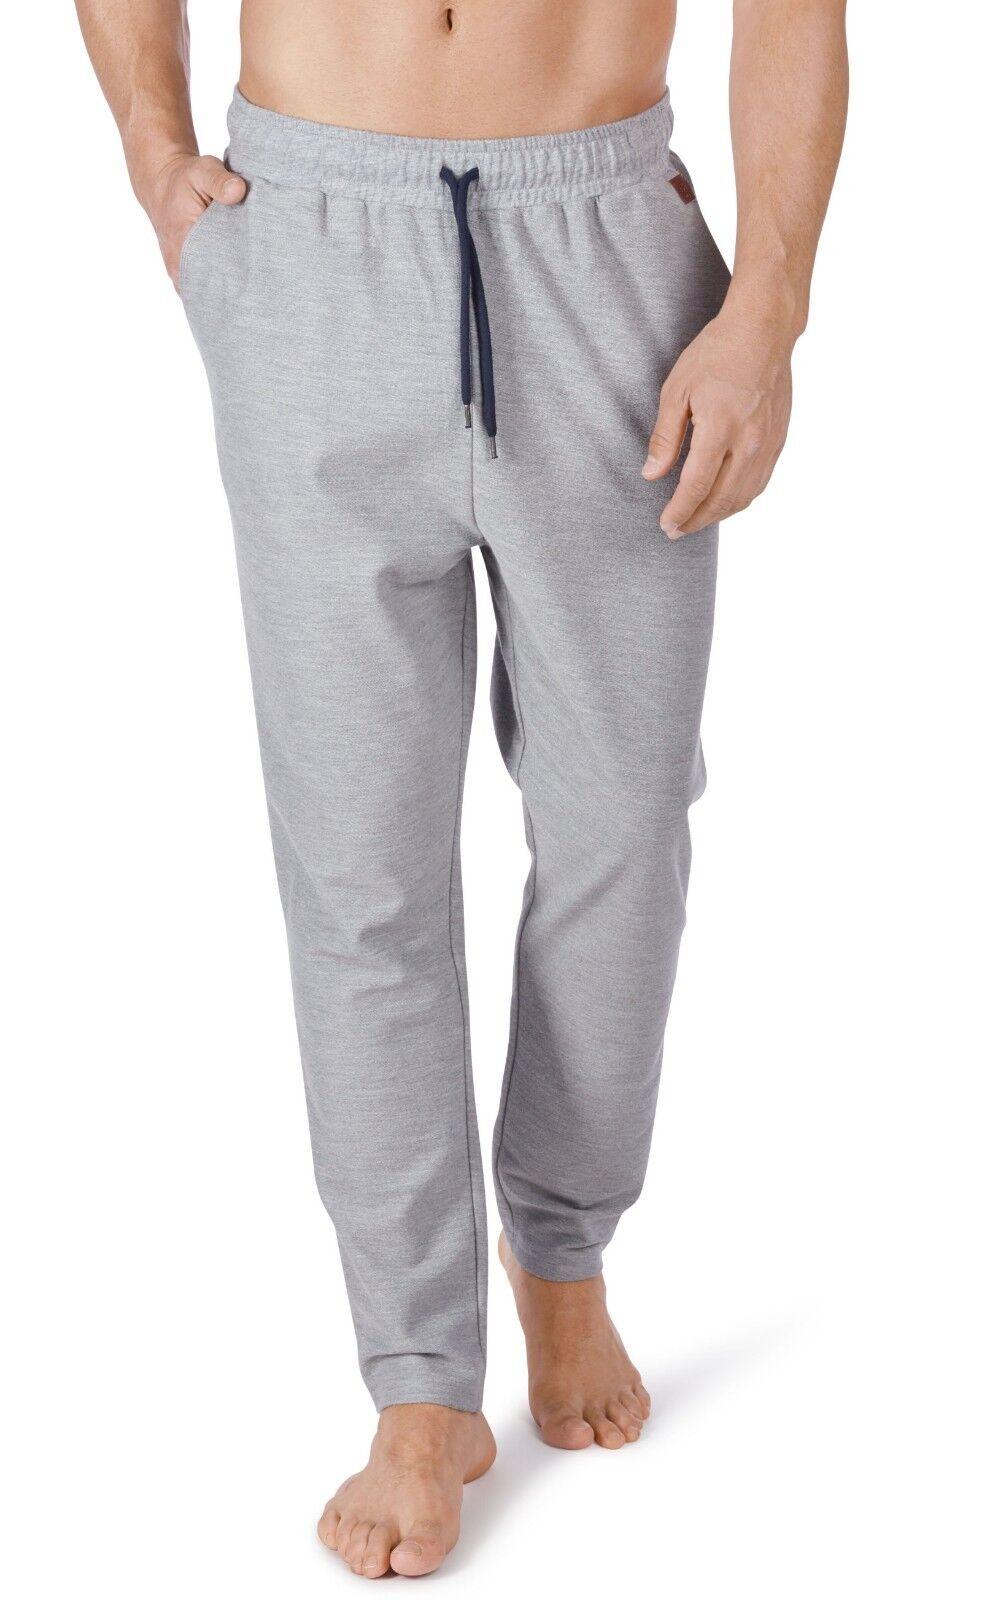 Skiny Herren Loungewear Collection Hose Freizeithose 86743 1692